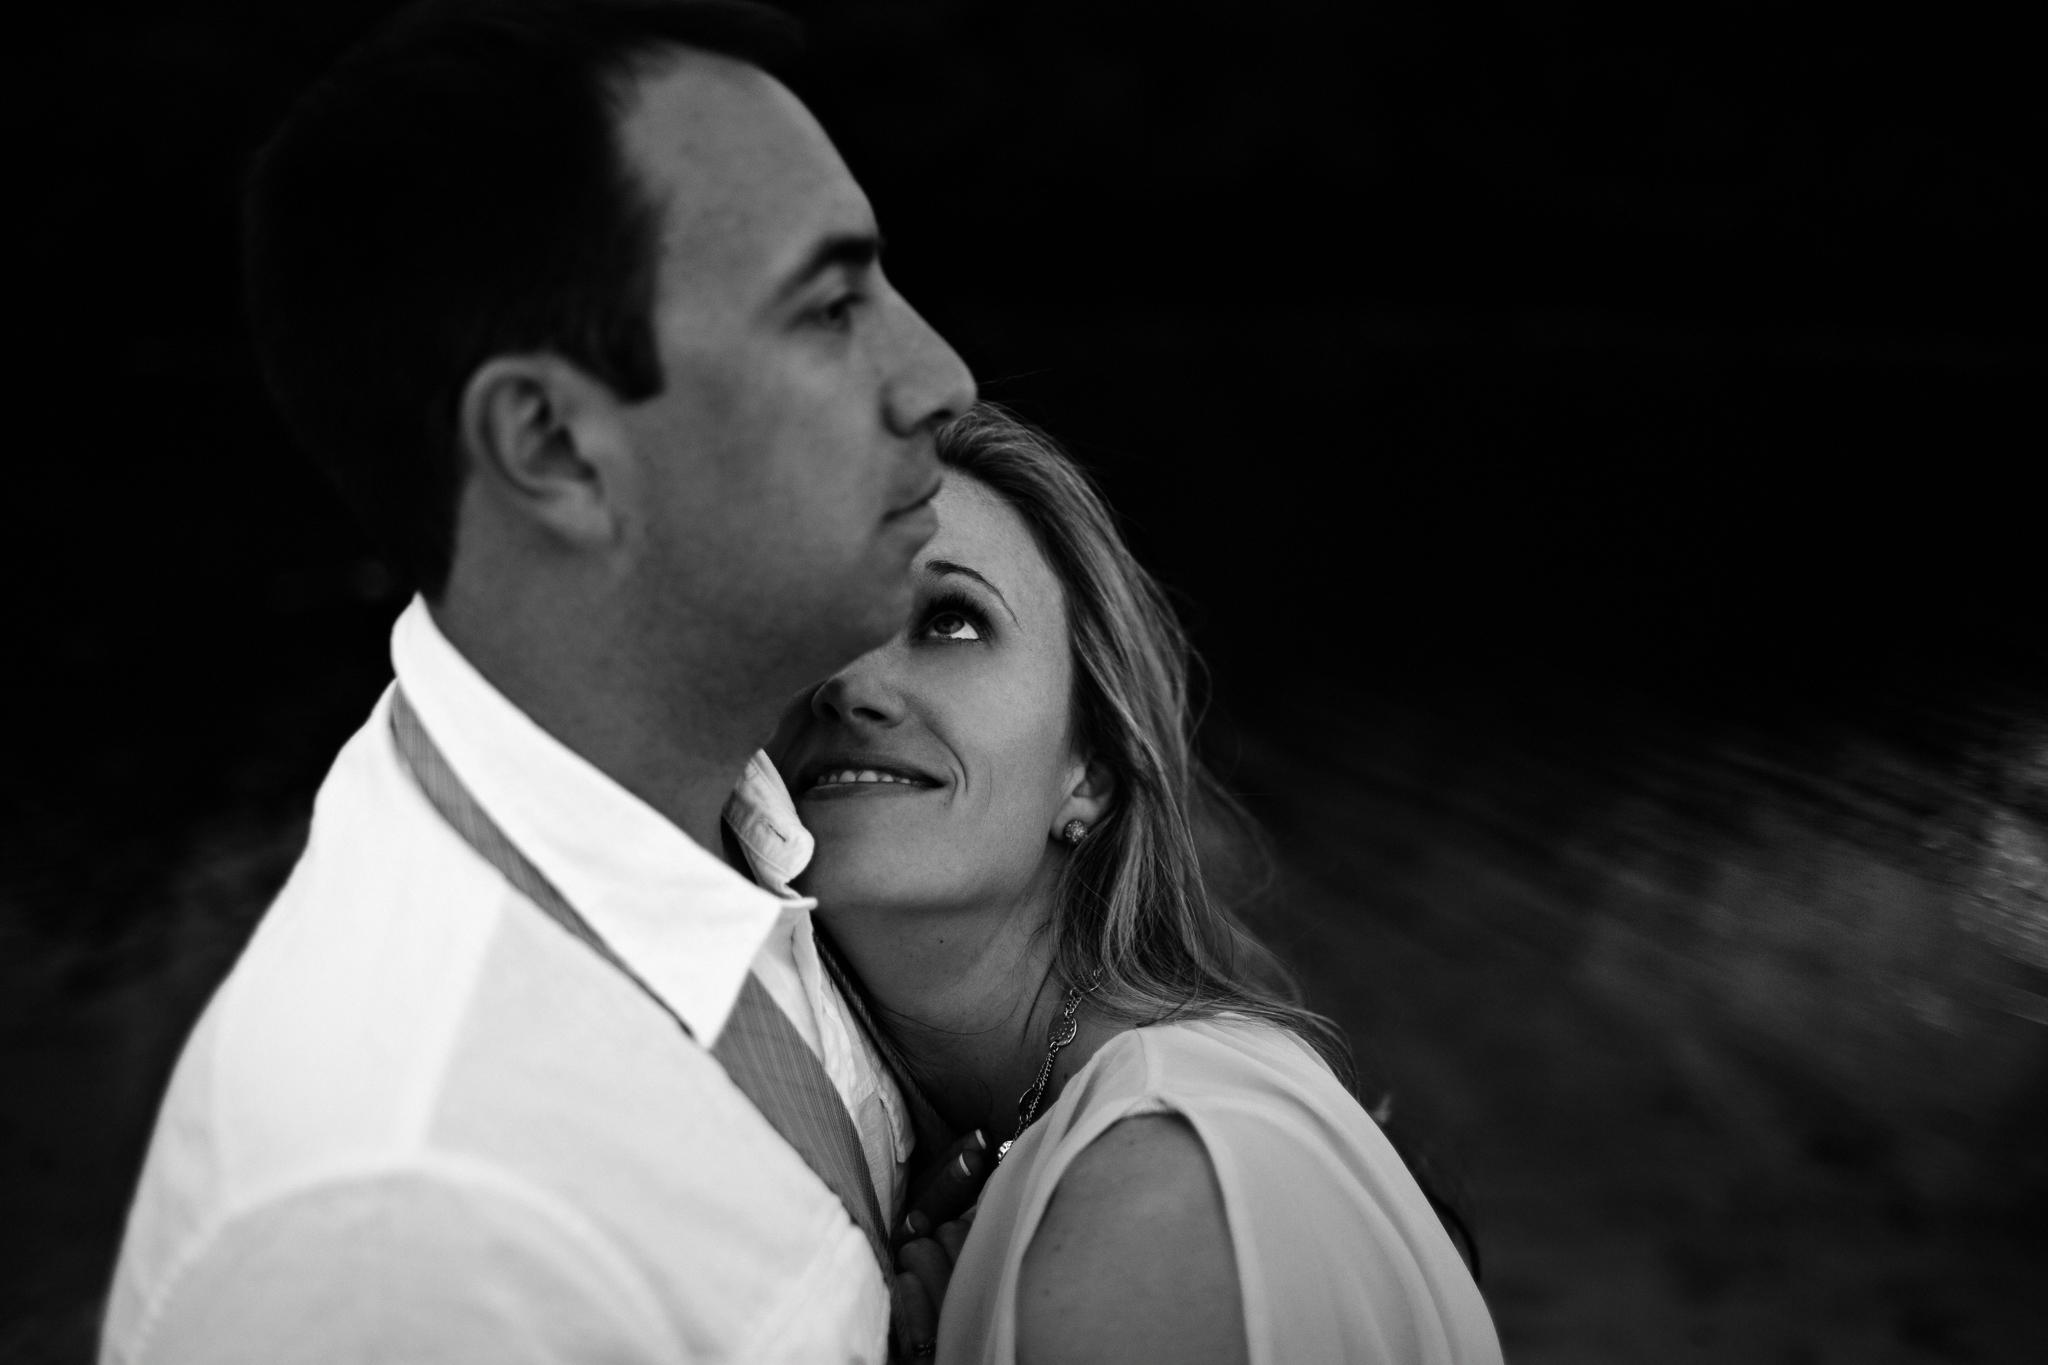 Jonathan&BrittanyEngagementSOCIALMEDIA-53.jpg